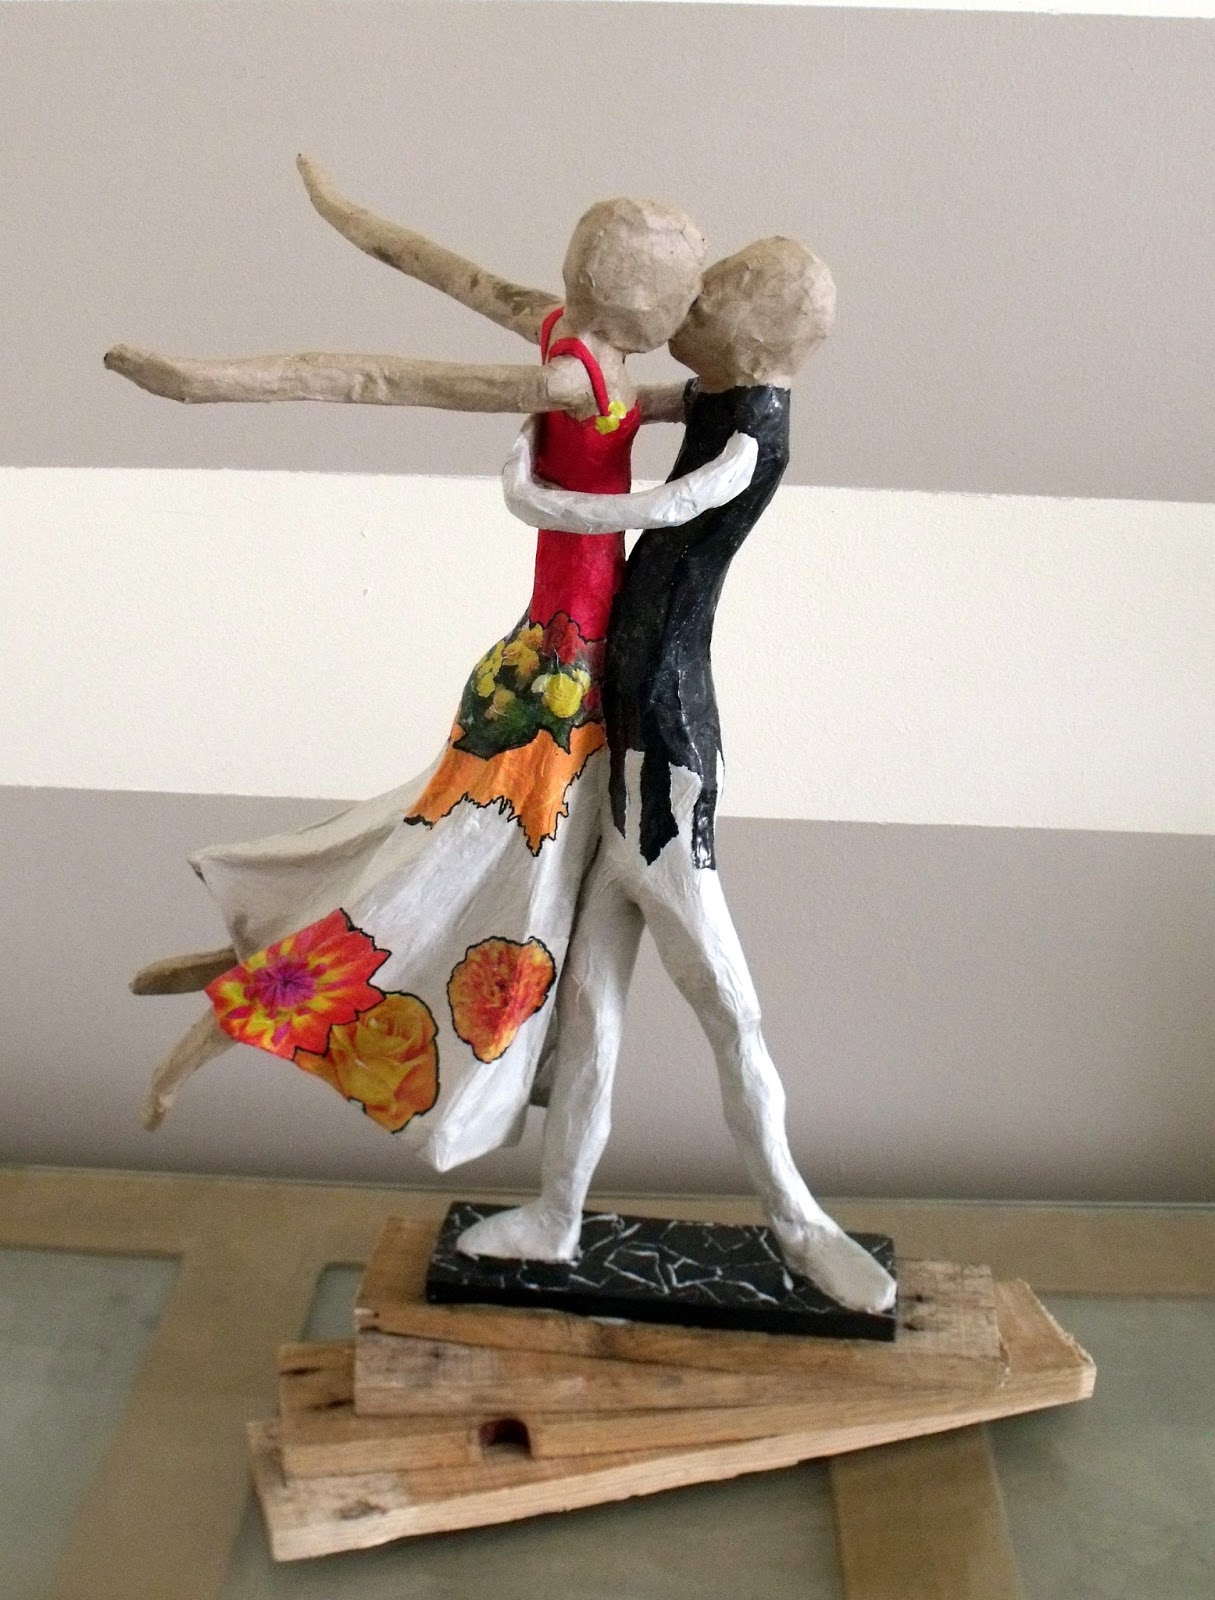 Avril 2013 - Sculptures en papier mache ...